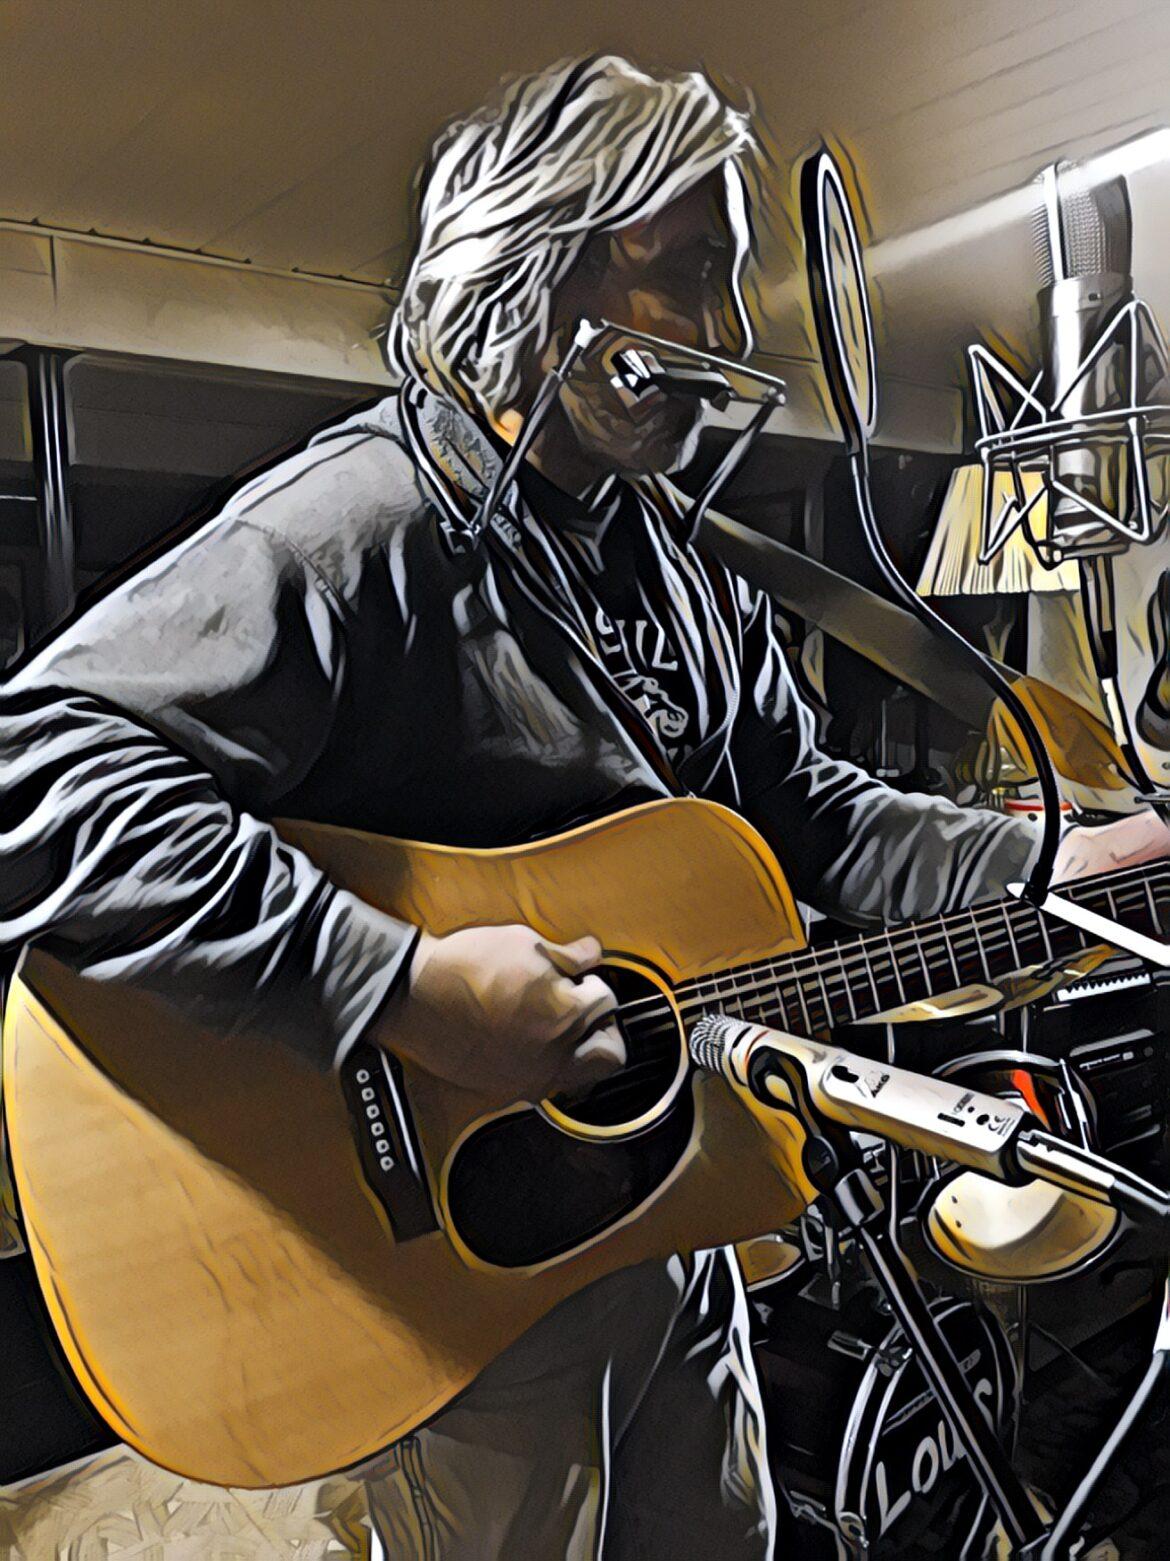 Local Musician Releases Solo Project Record